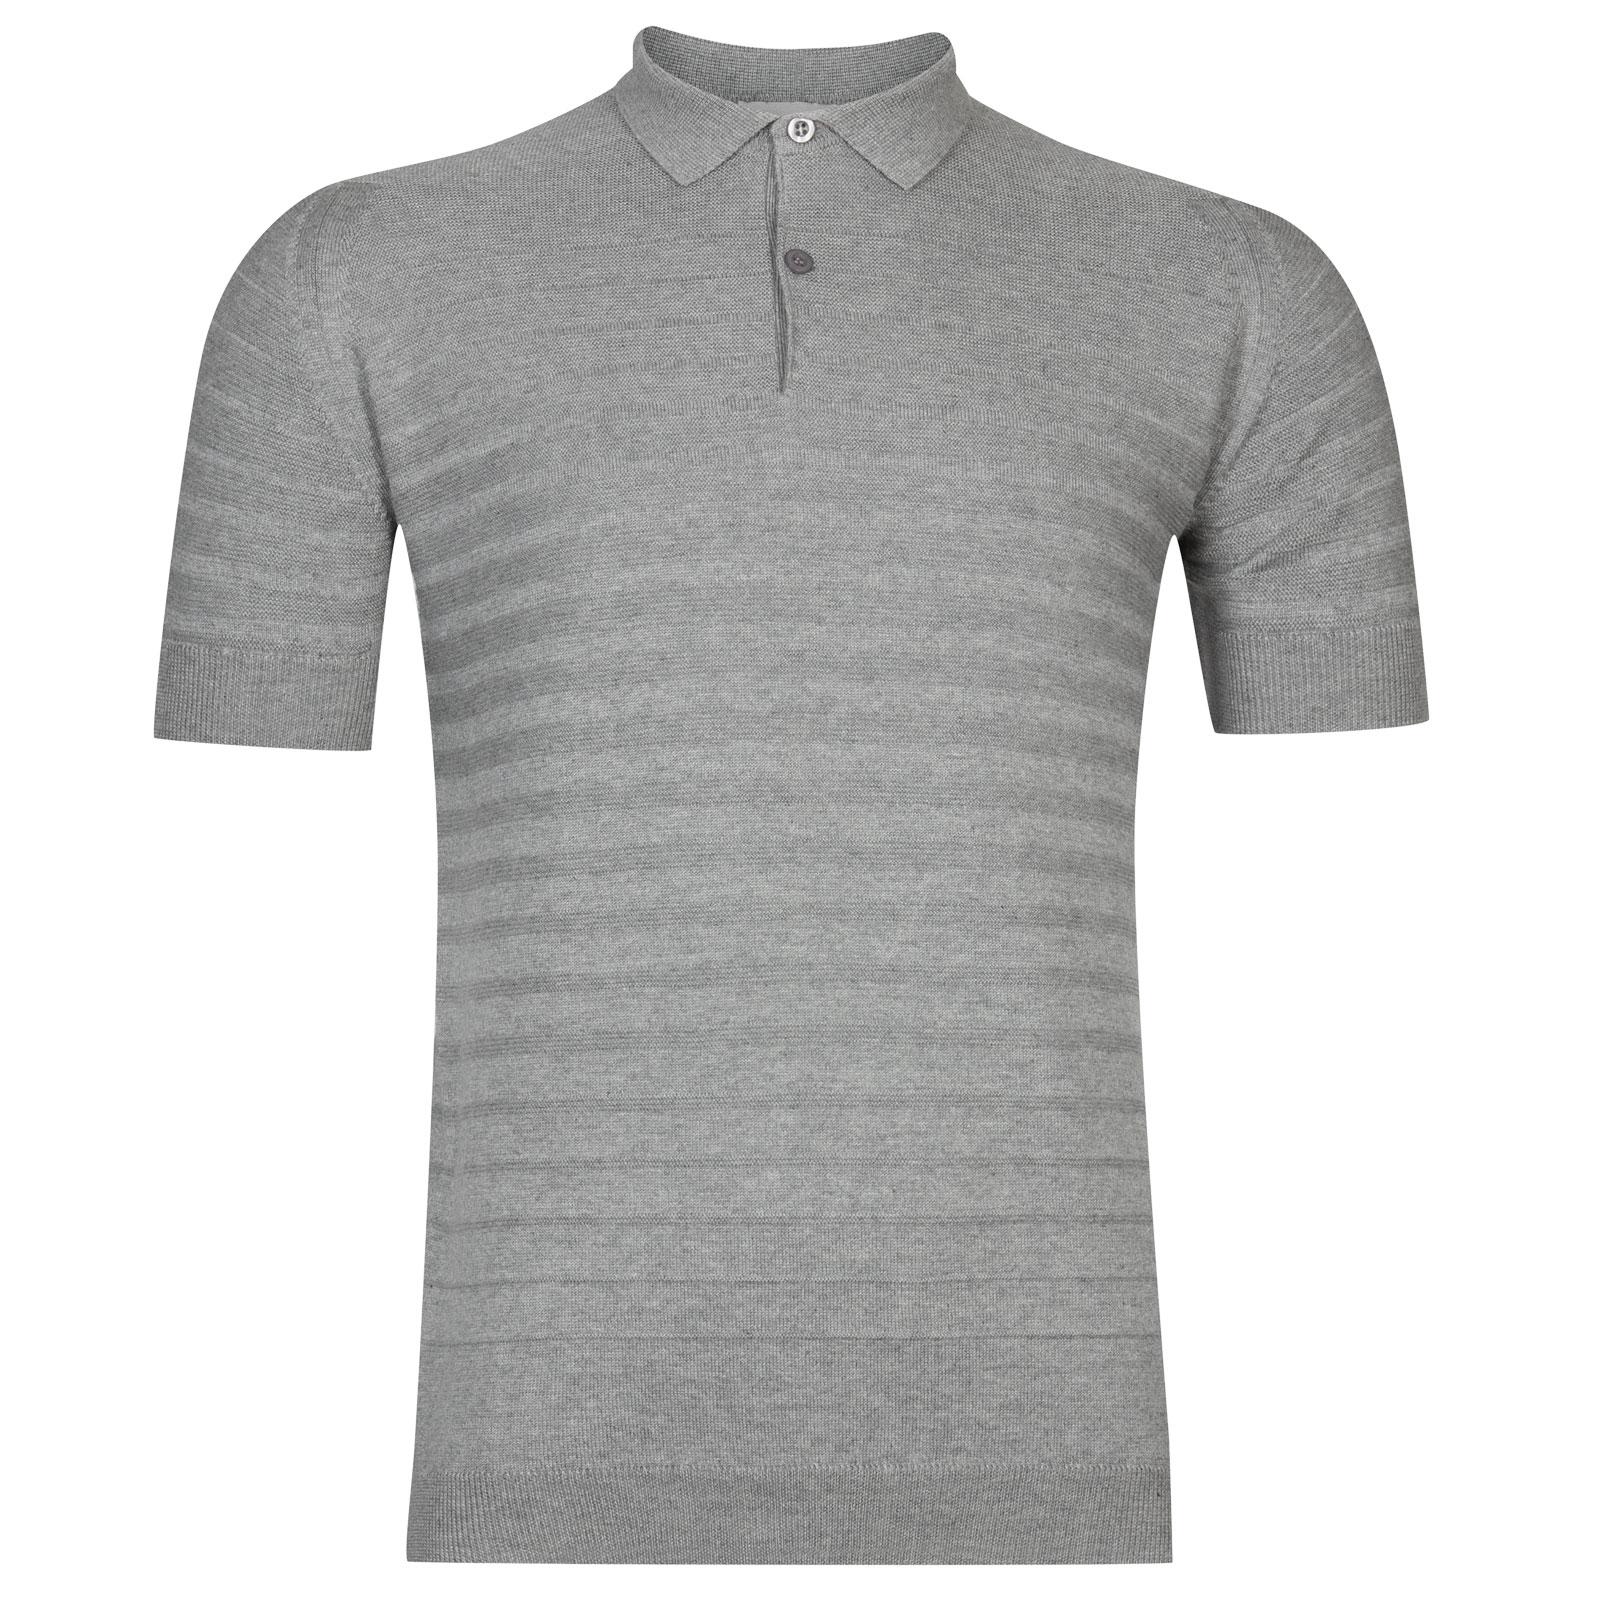 John Smedley Zuber Cotton Shirt in Silver -Xl